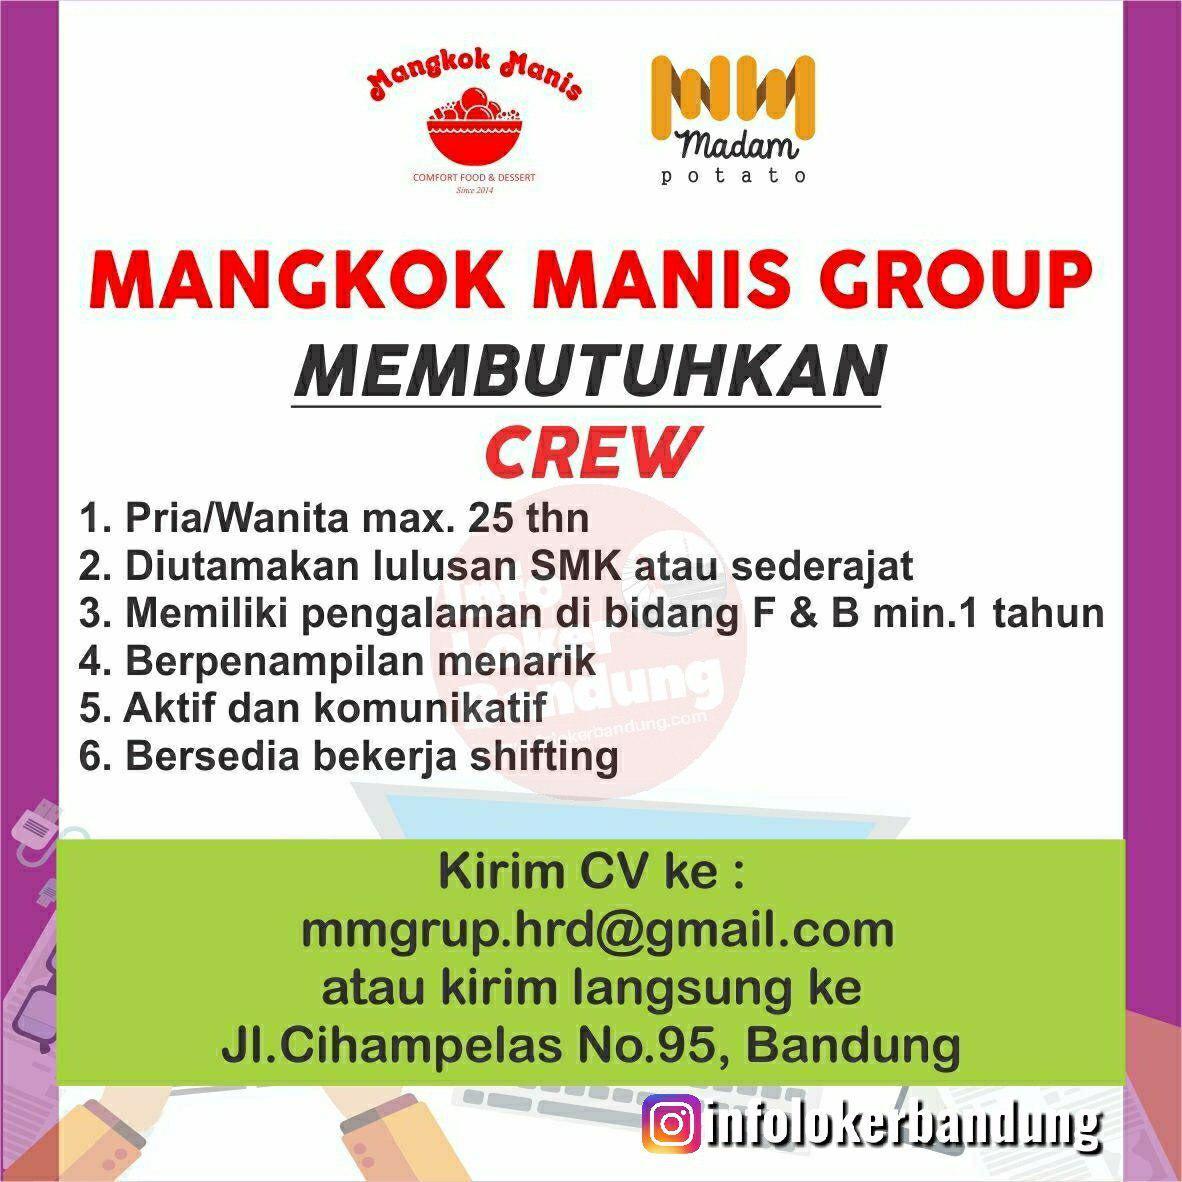 Lowongan Kerja Mangkok Manis Group Bandung April 2019